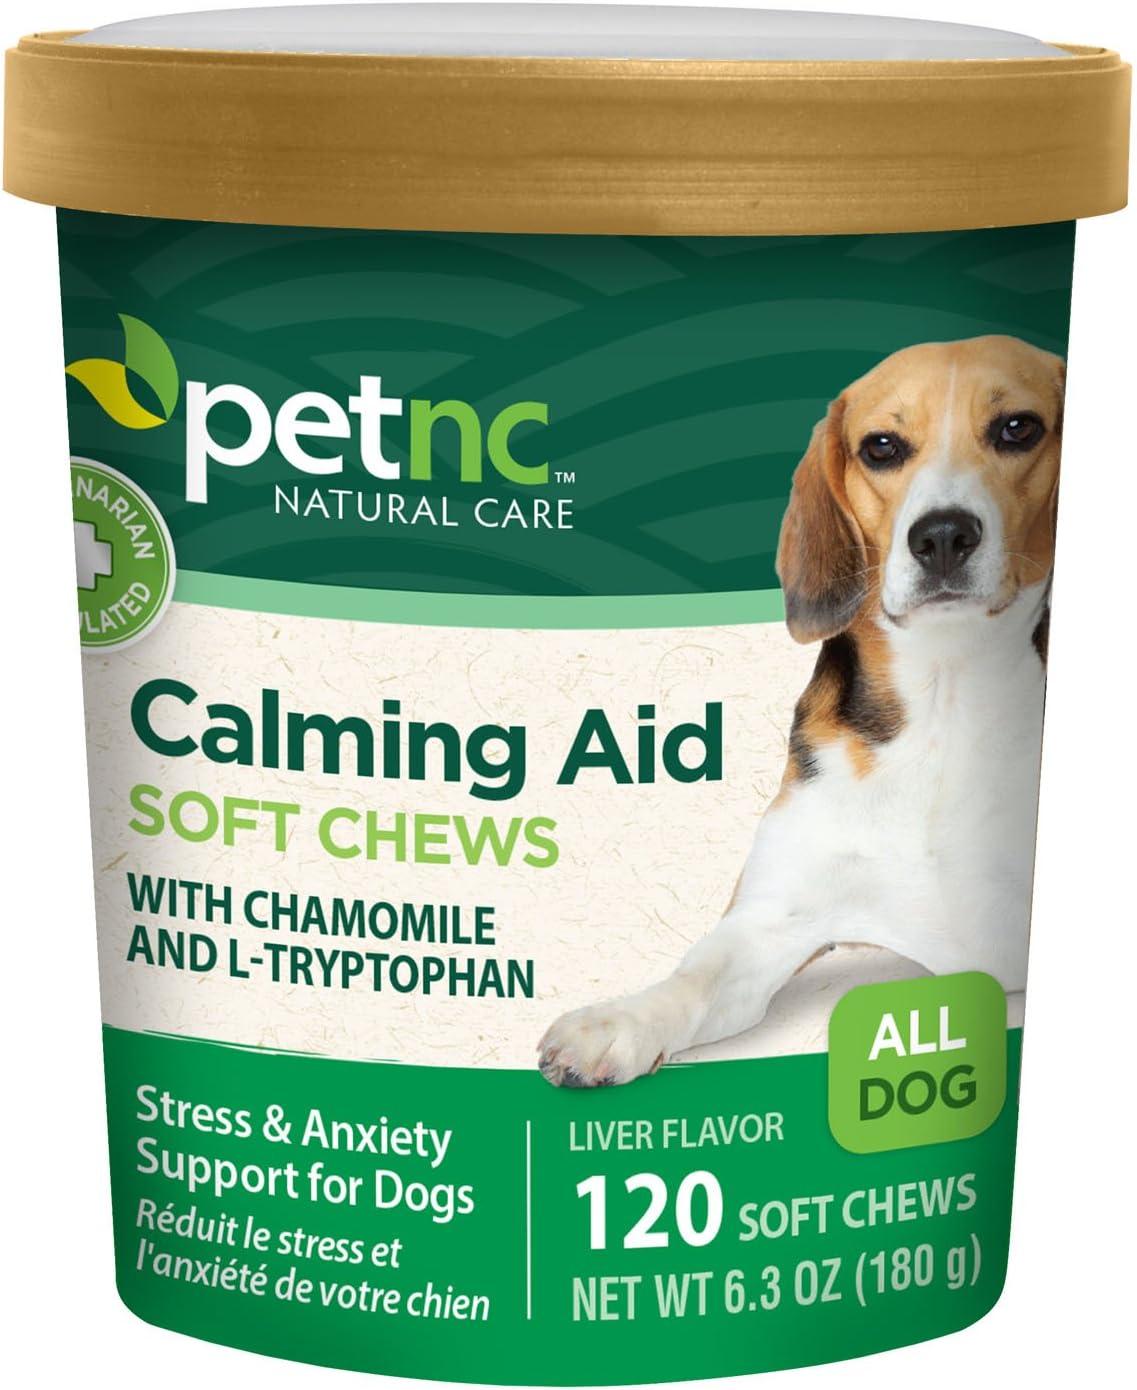 PetNC Natural Care Calming Aid Soft Chews Dog Supplement